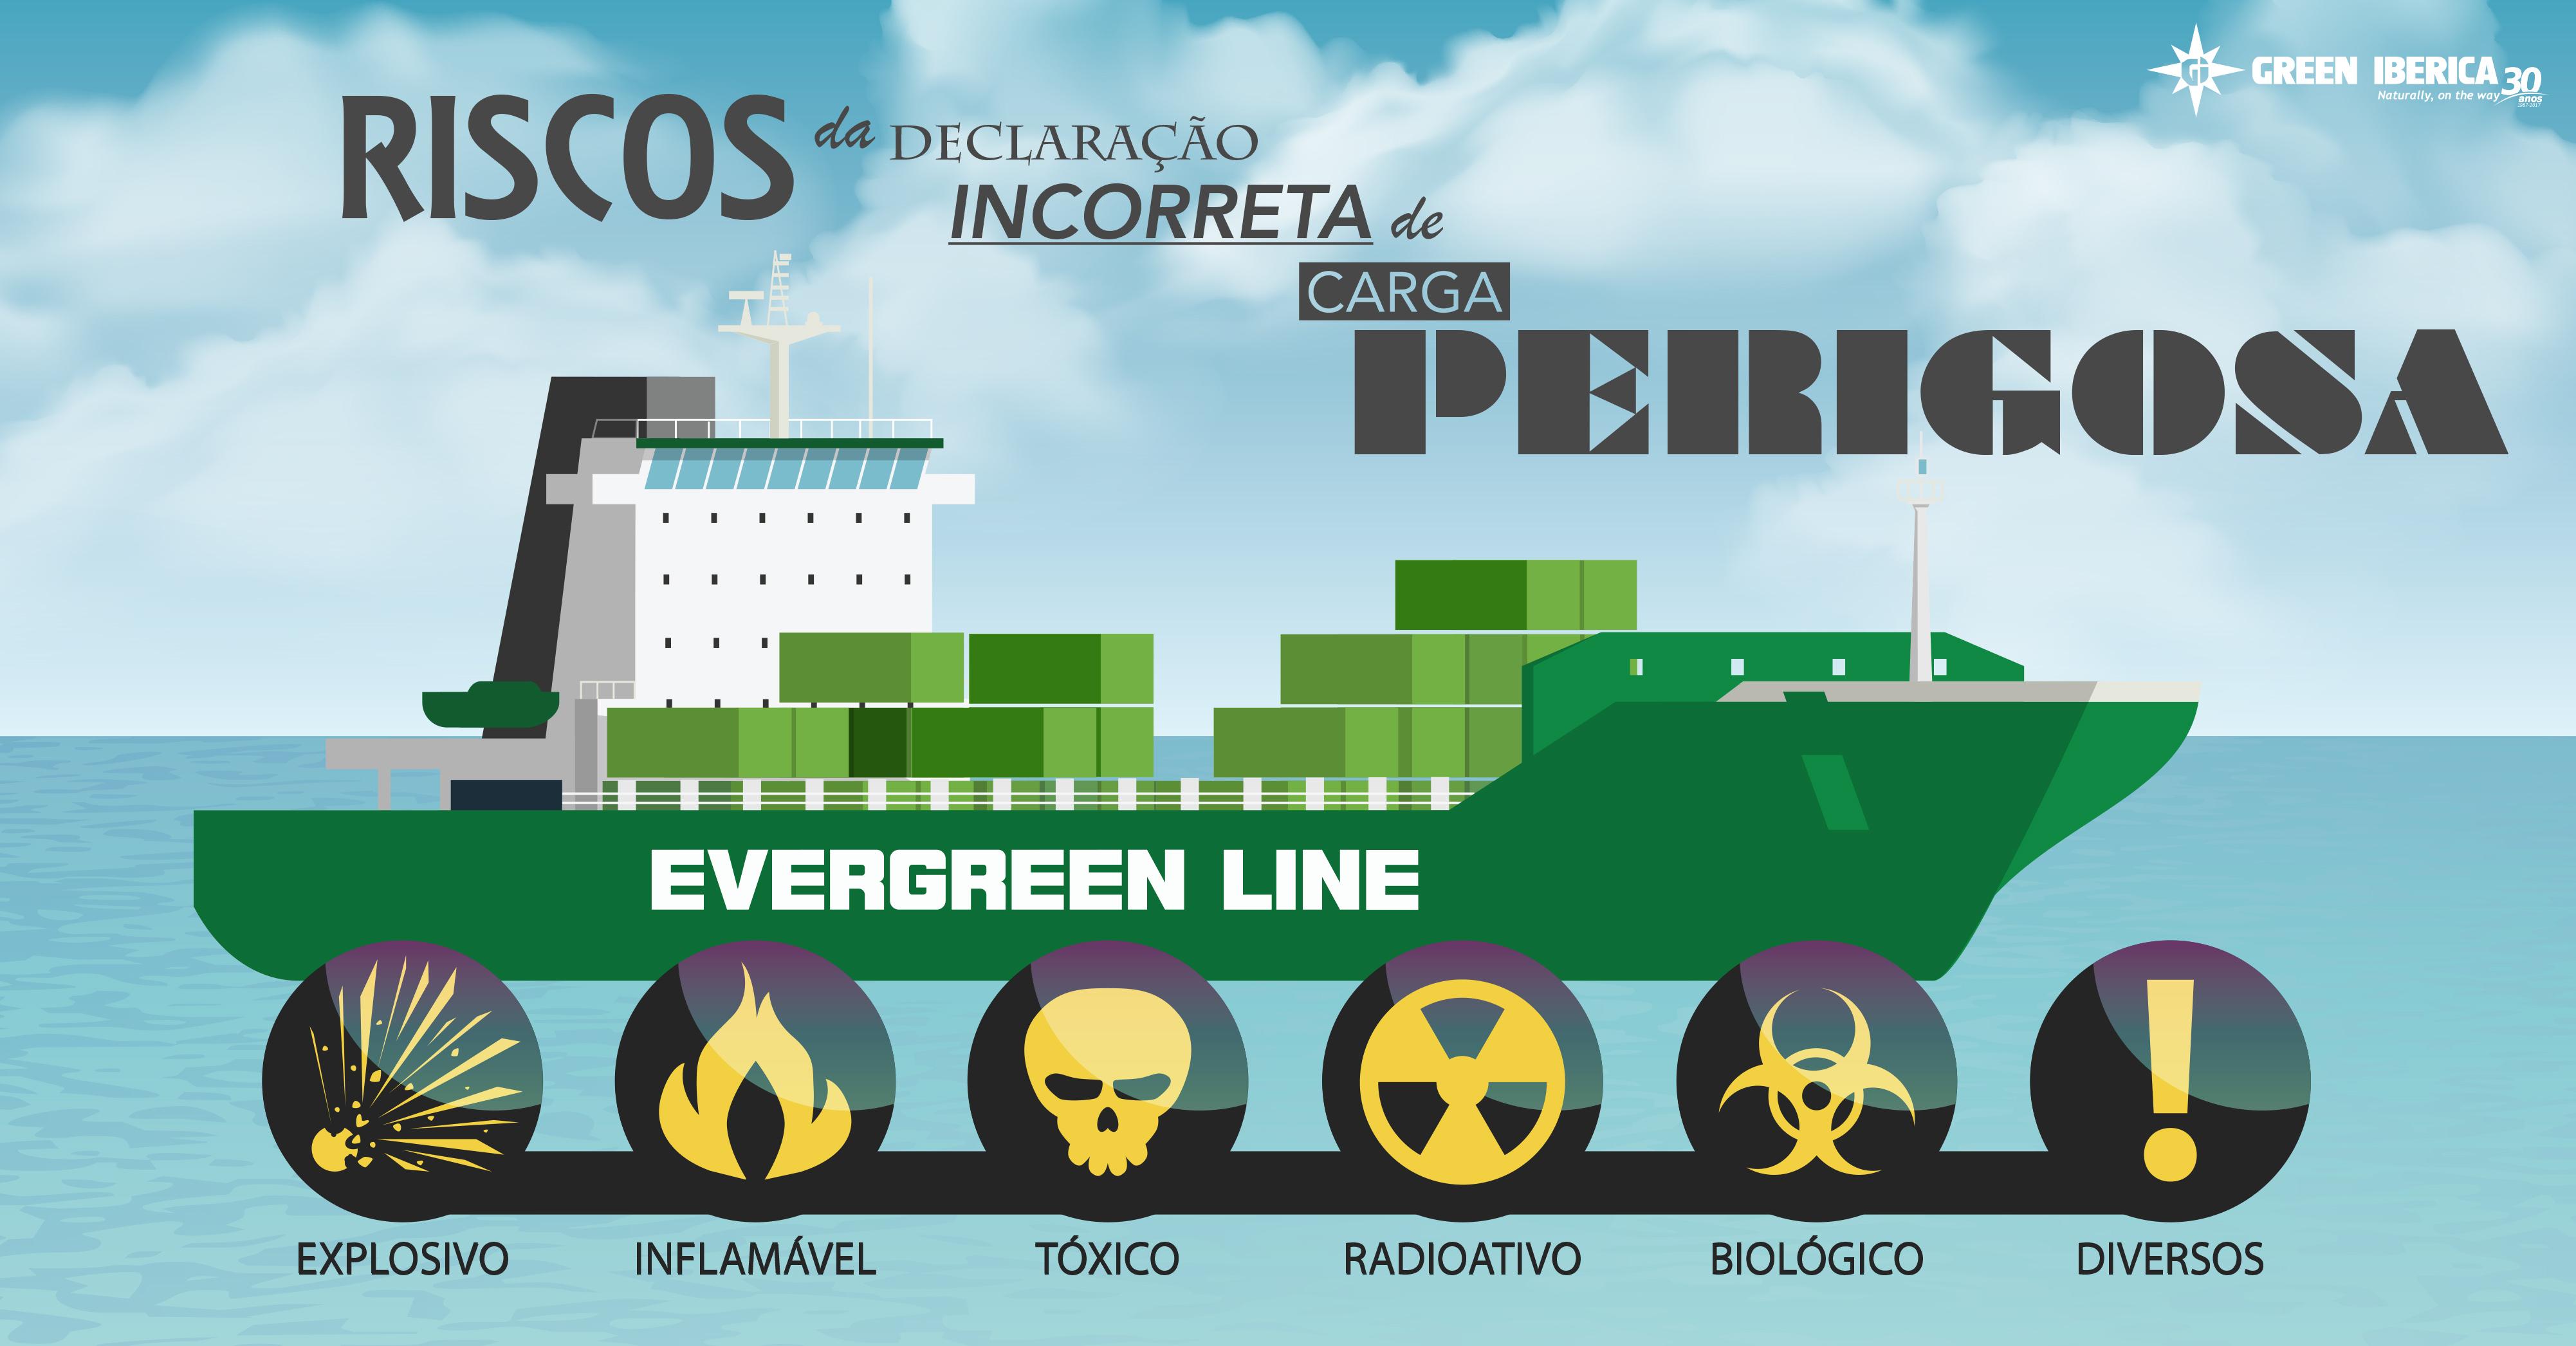 Riscos da Declaracao incorreta de carga perigosa. evergreen line, green iberica